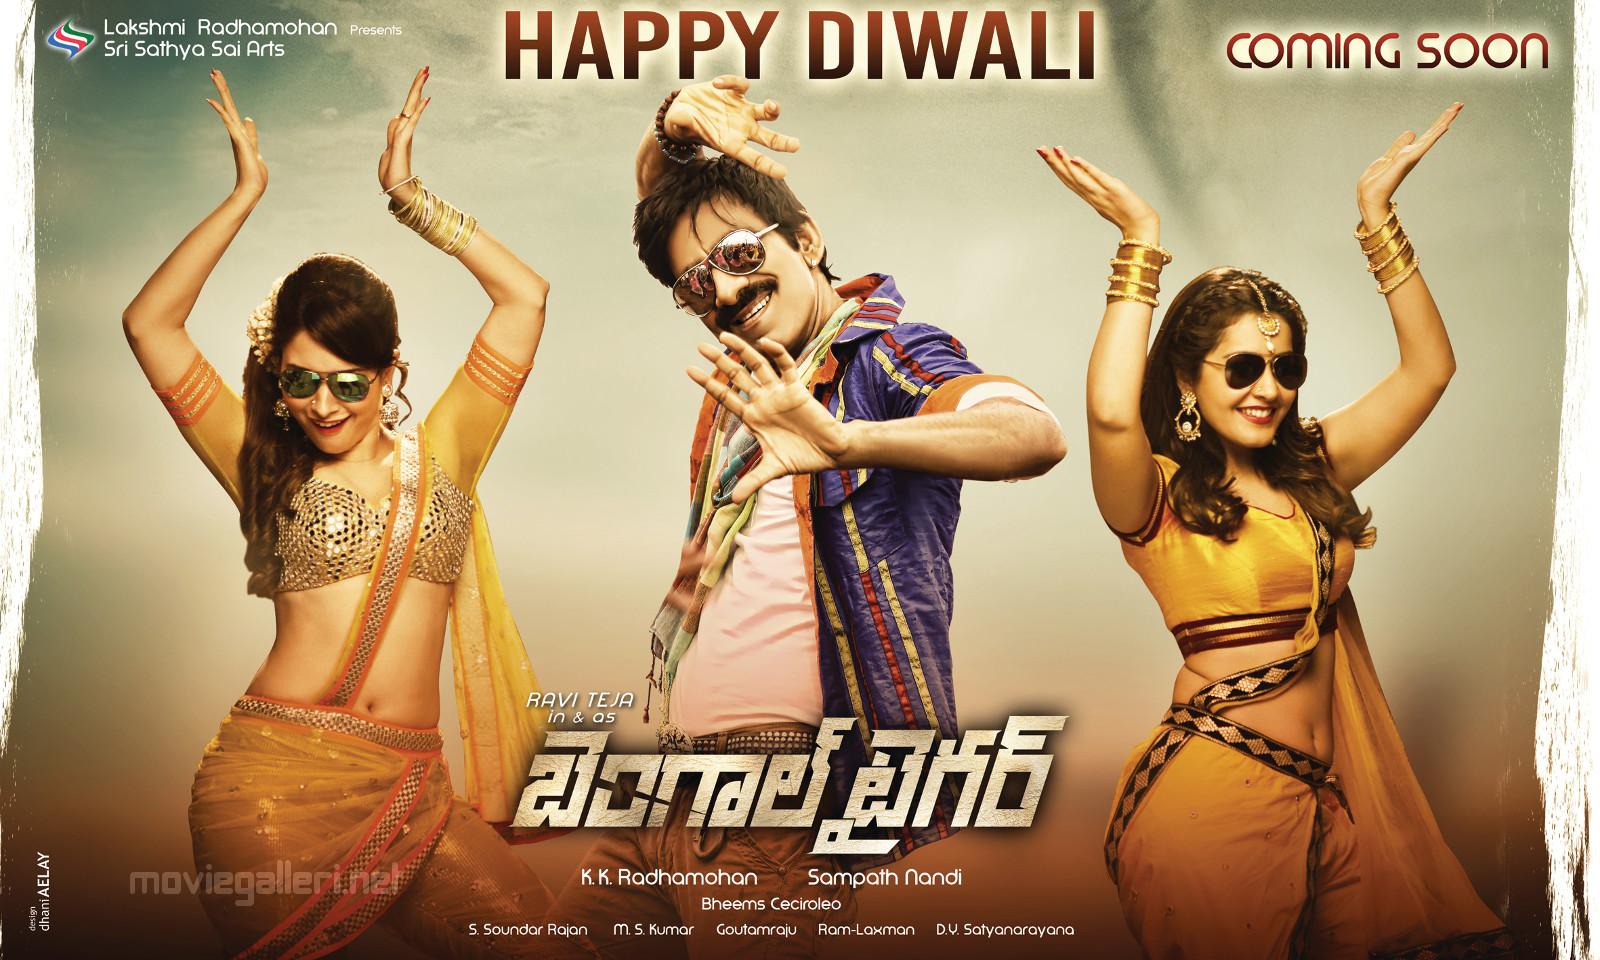 Tamanna, Ravi Teja & Rashi Khanna in Bengal Tiger Movie Diwali Wishes Posters